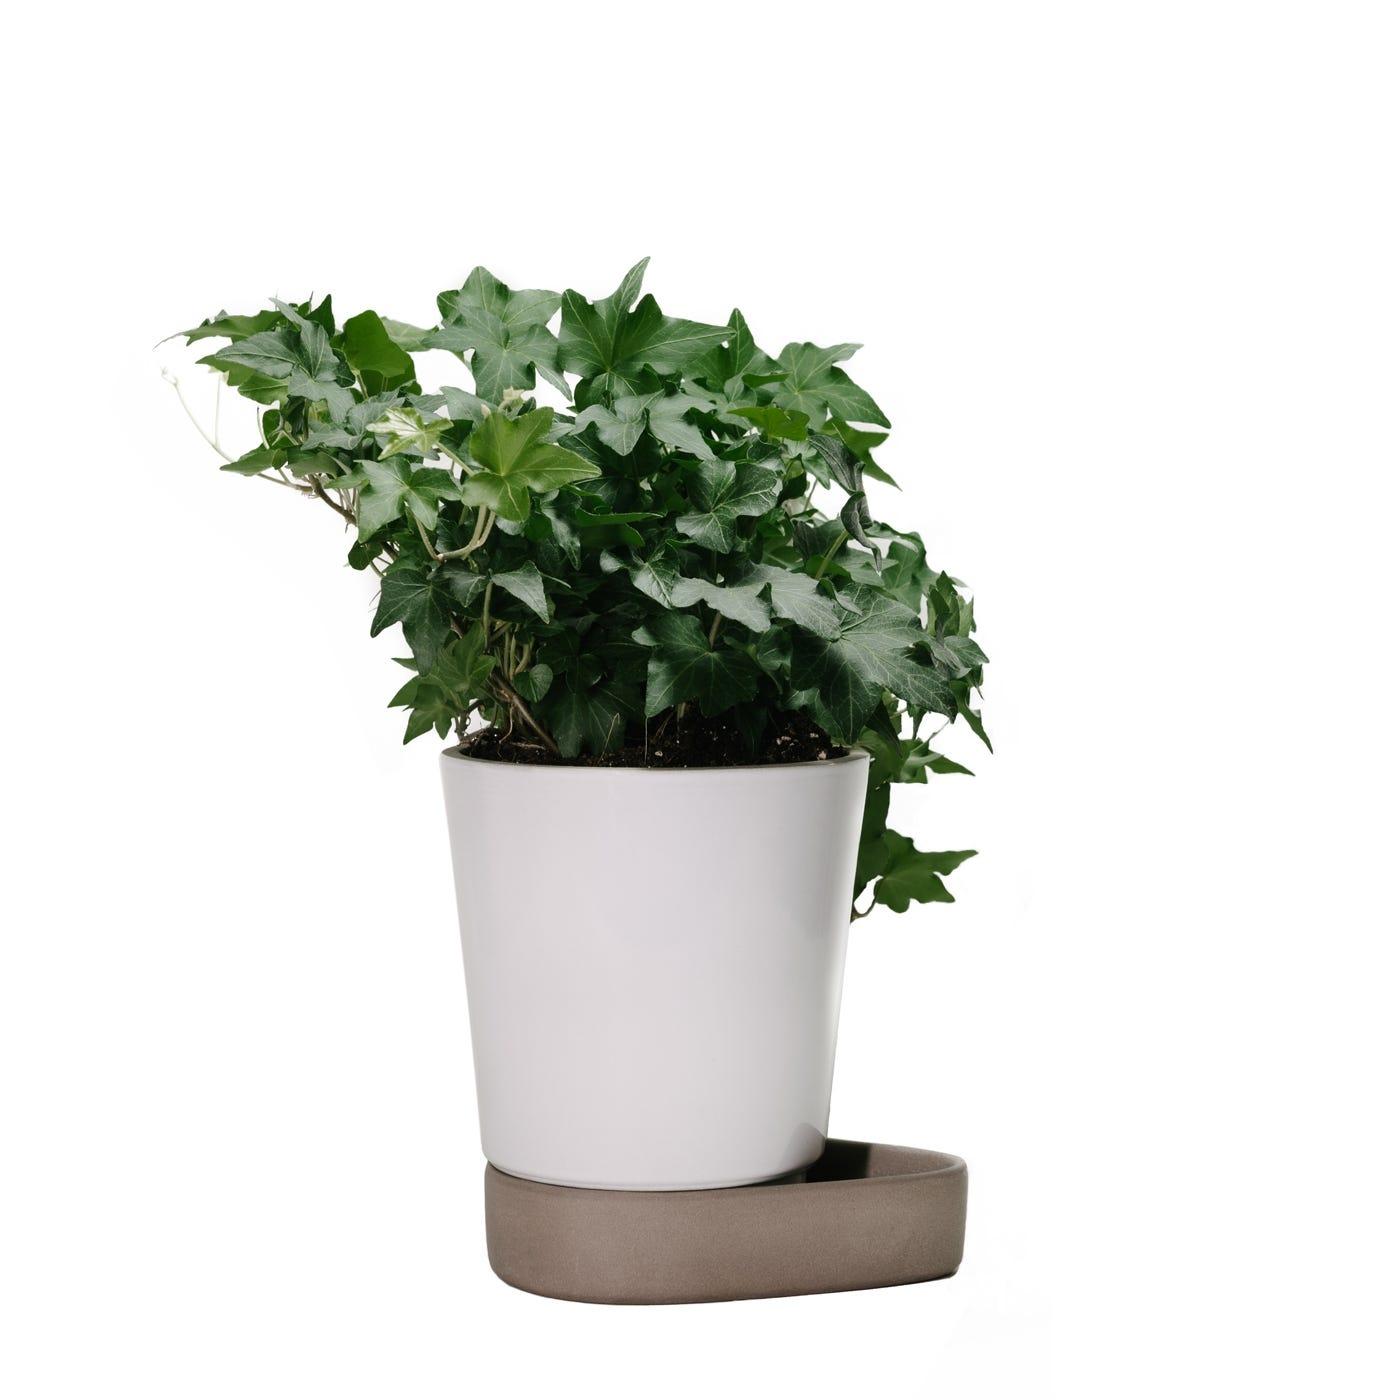 Sip Plant Pot